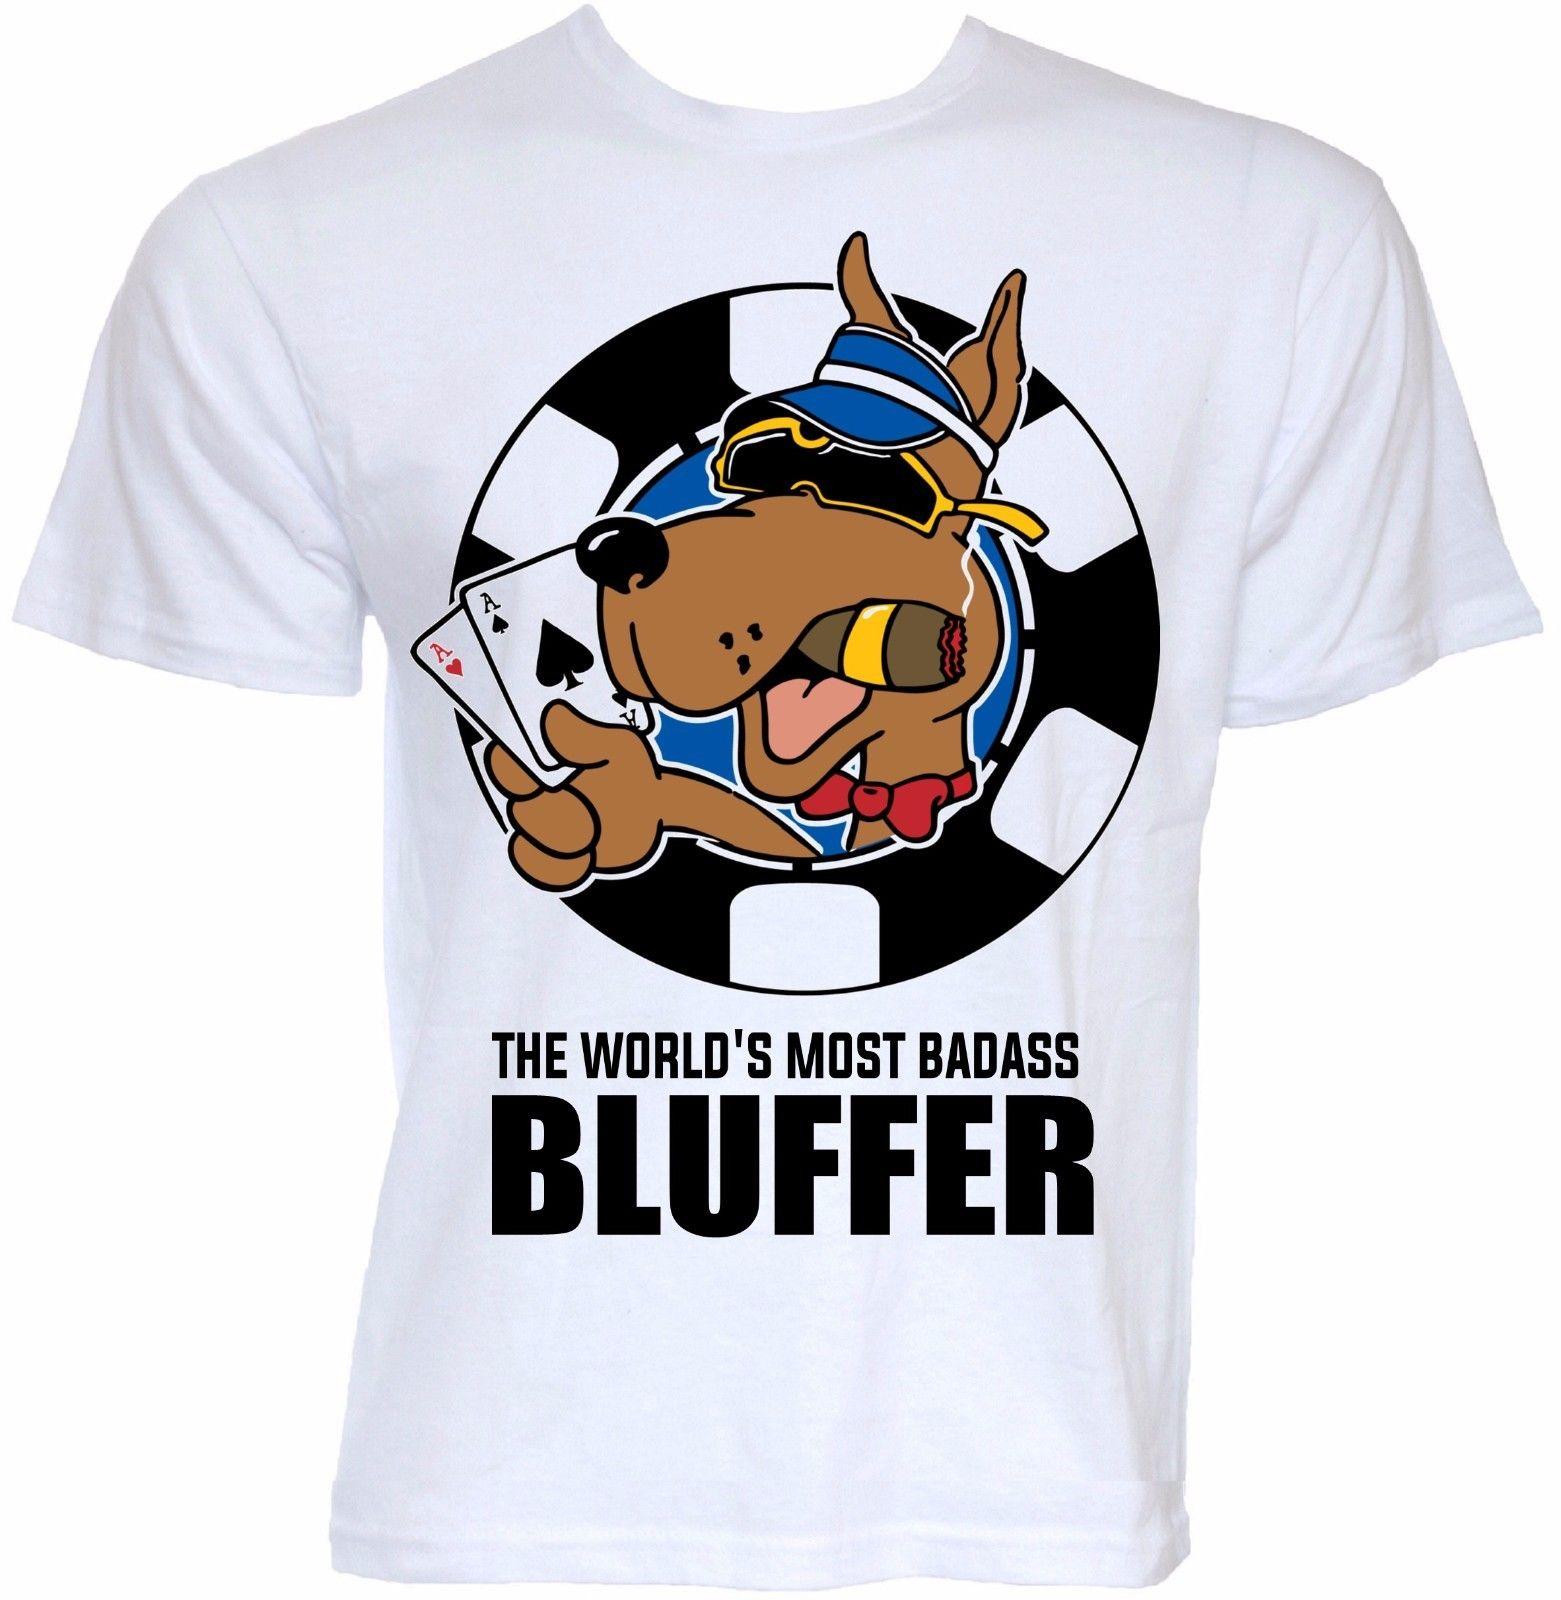 MENS FUNNY COOL NOVELTY PRO POKER DOG CHIPS JOKE SLOGAN T-SHIRTS STYLISH GIFTS 100% Cotton Fashion T Shirts Top Tee ...